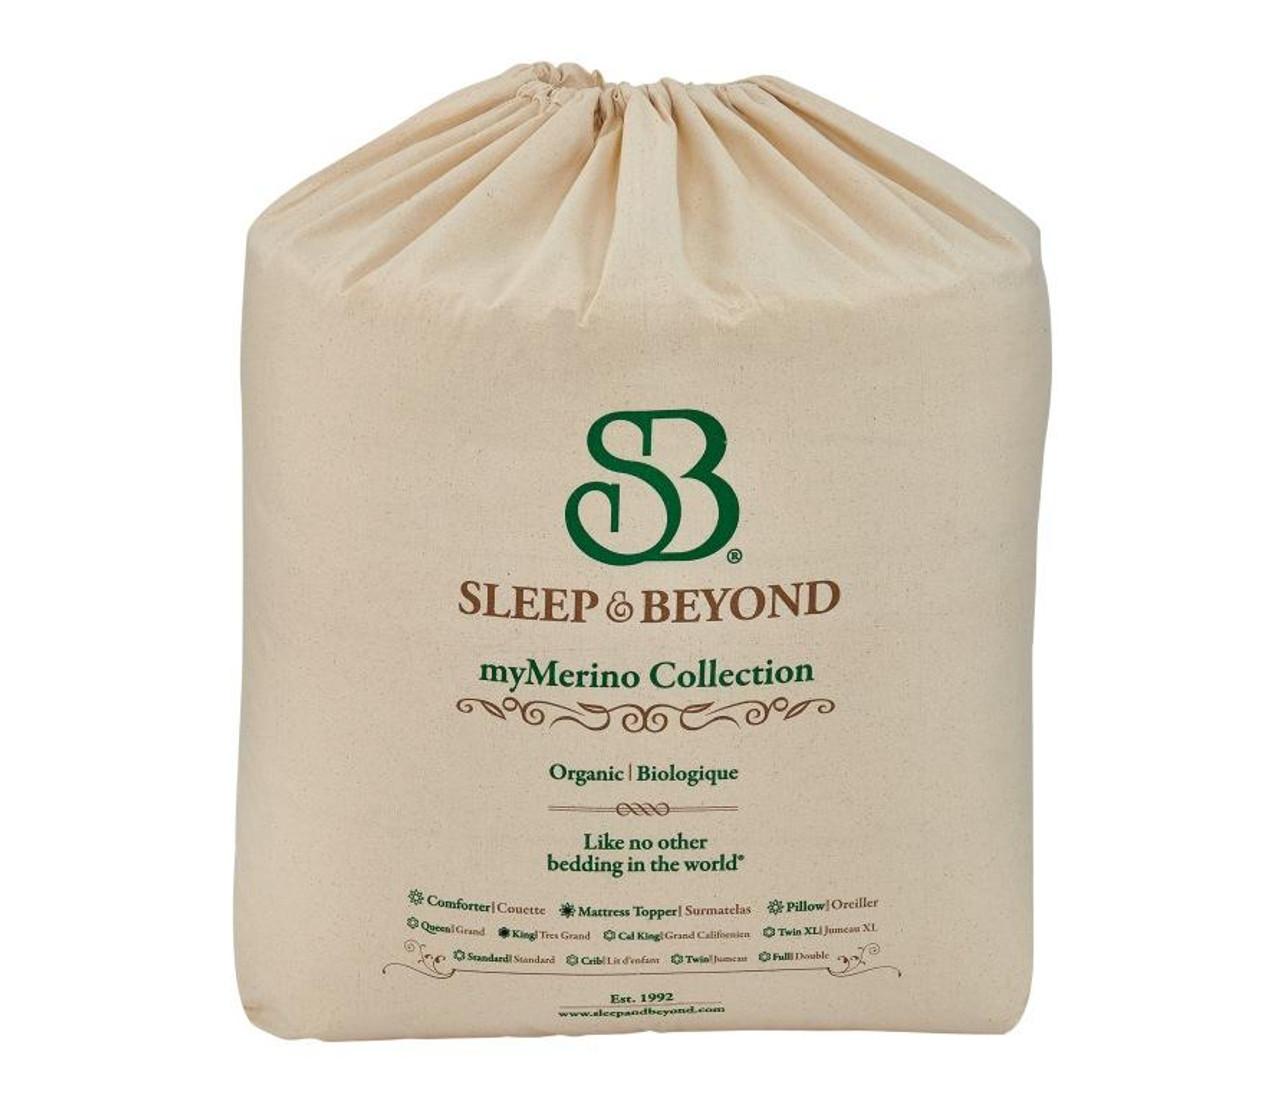 Sleep & Beyond myMerino™ Topper, Organic Merino Wool Mattress Topper Packaging